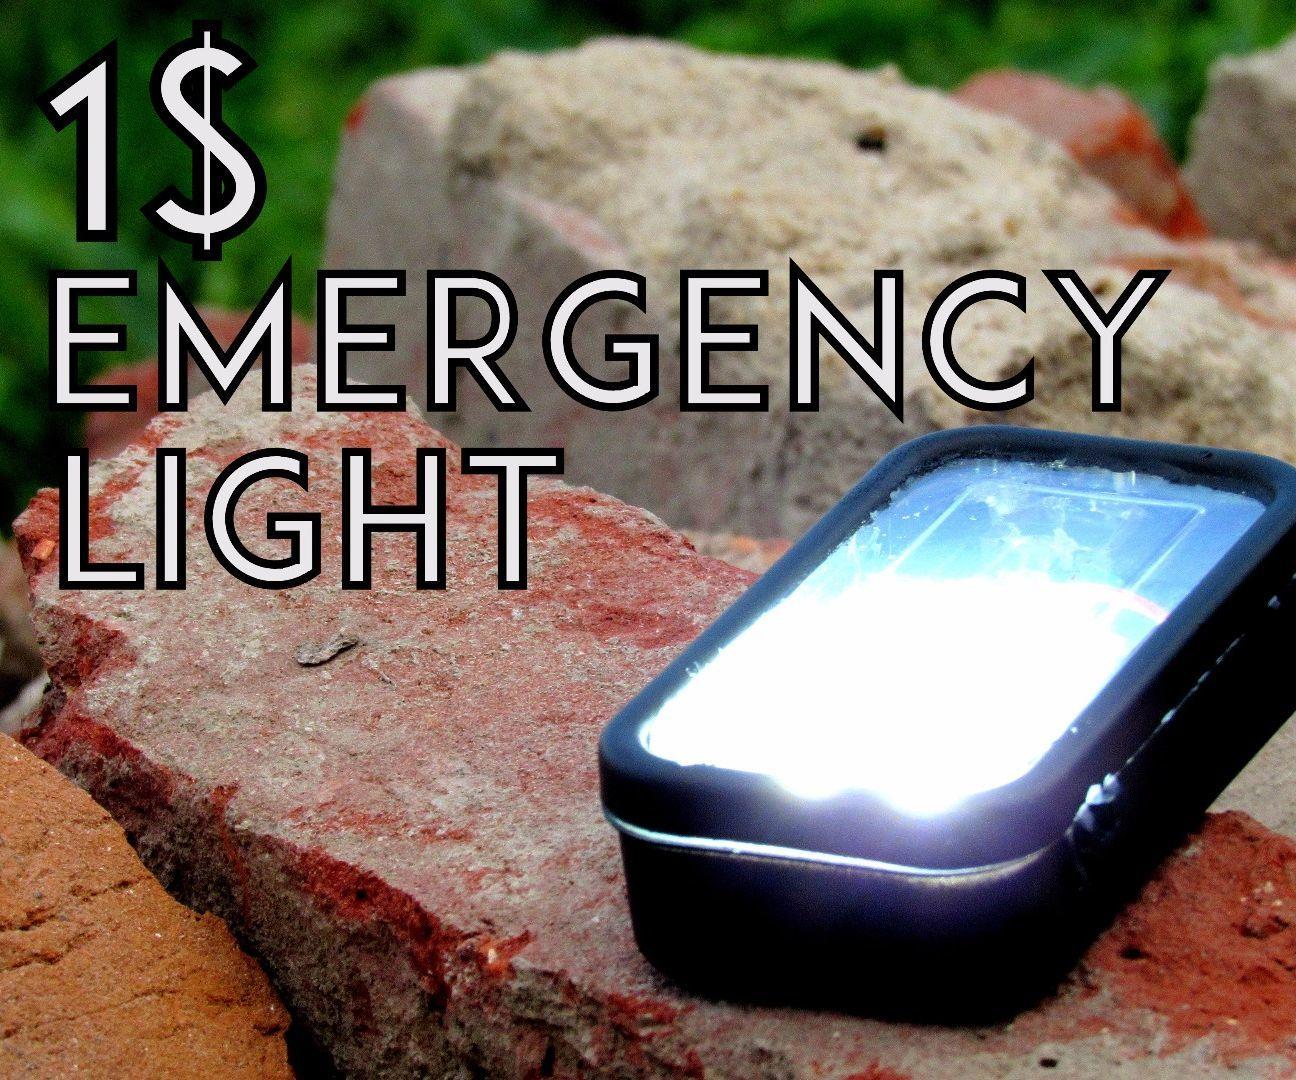 How to make a 1 $ Pocket Emergency Light